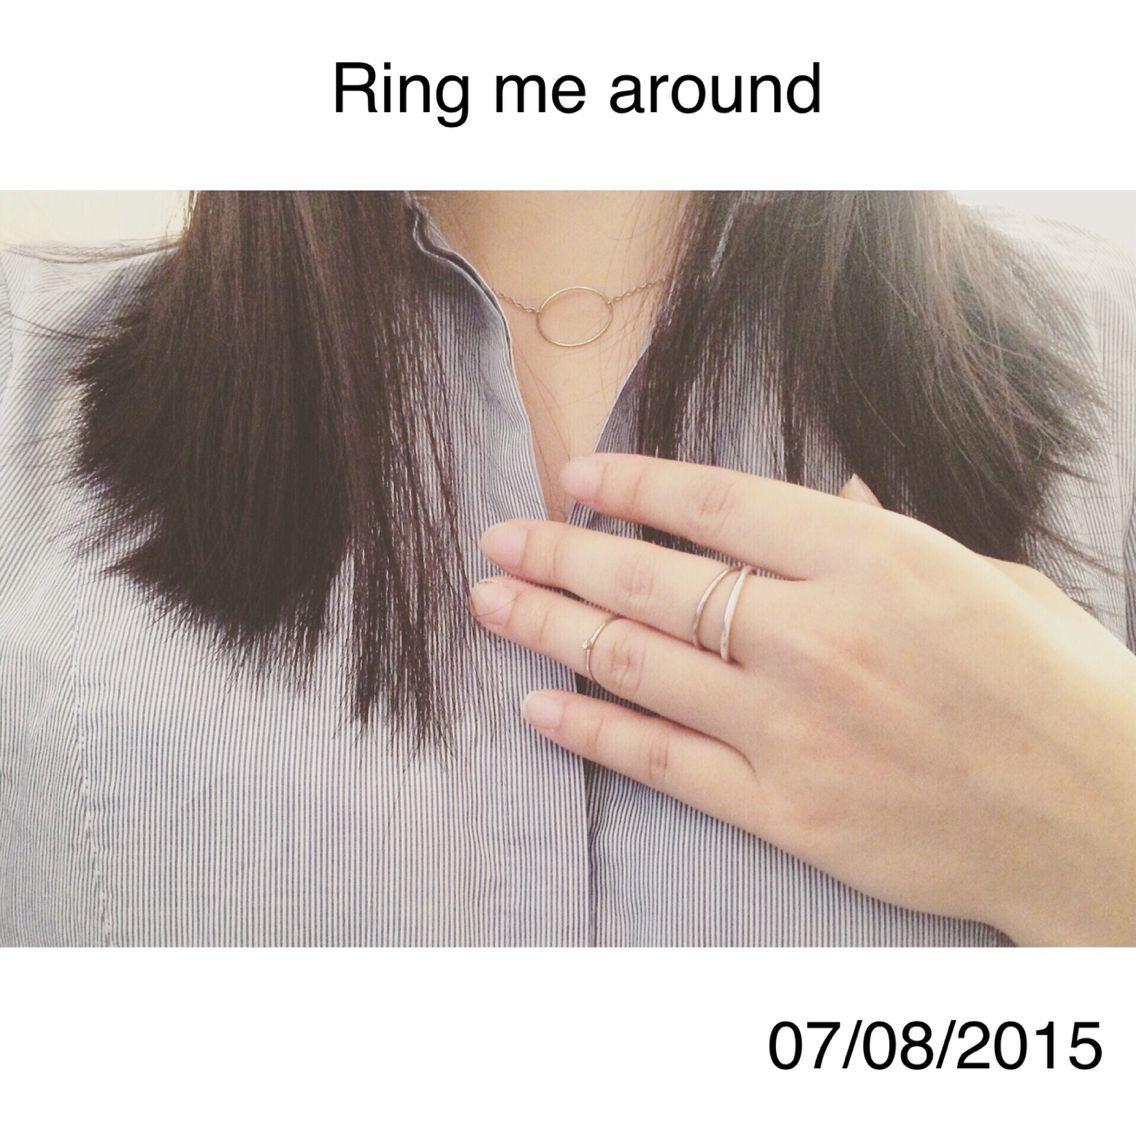 Ring me around